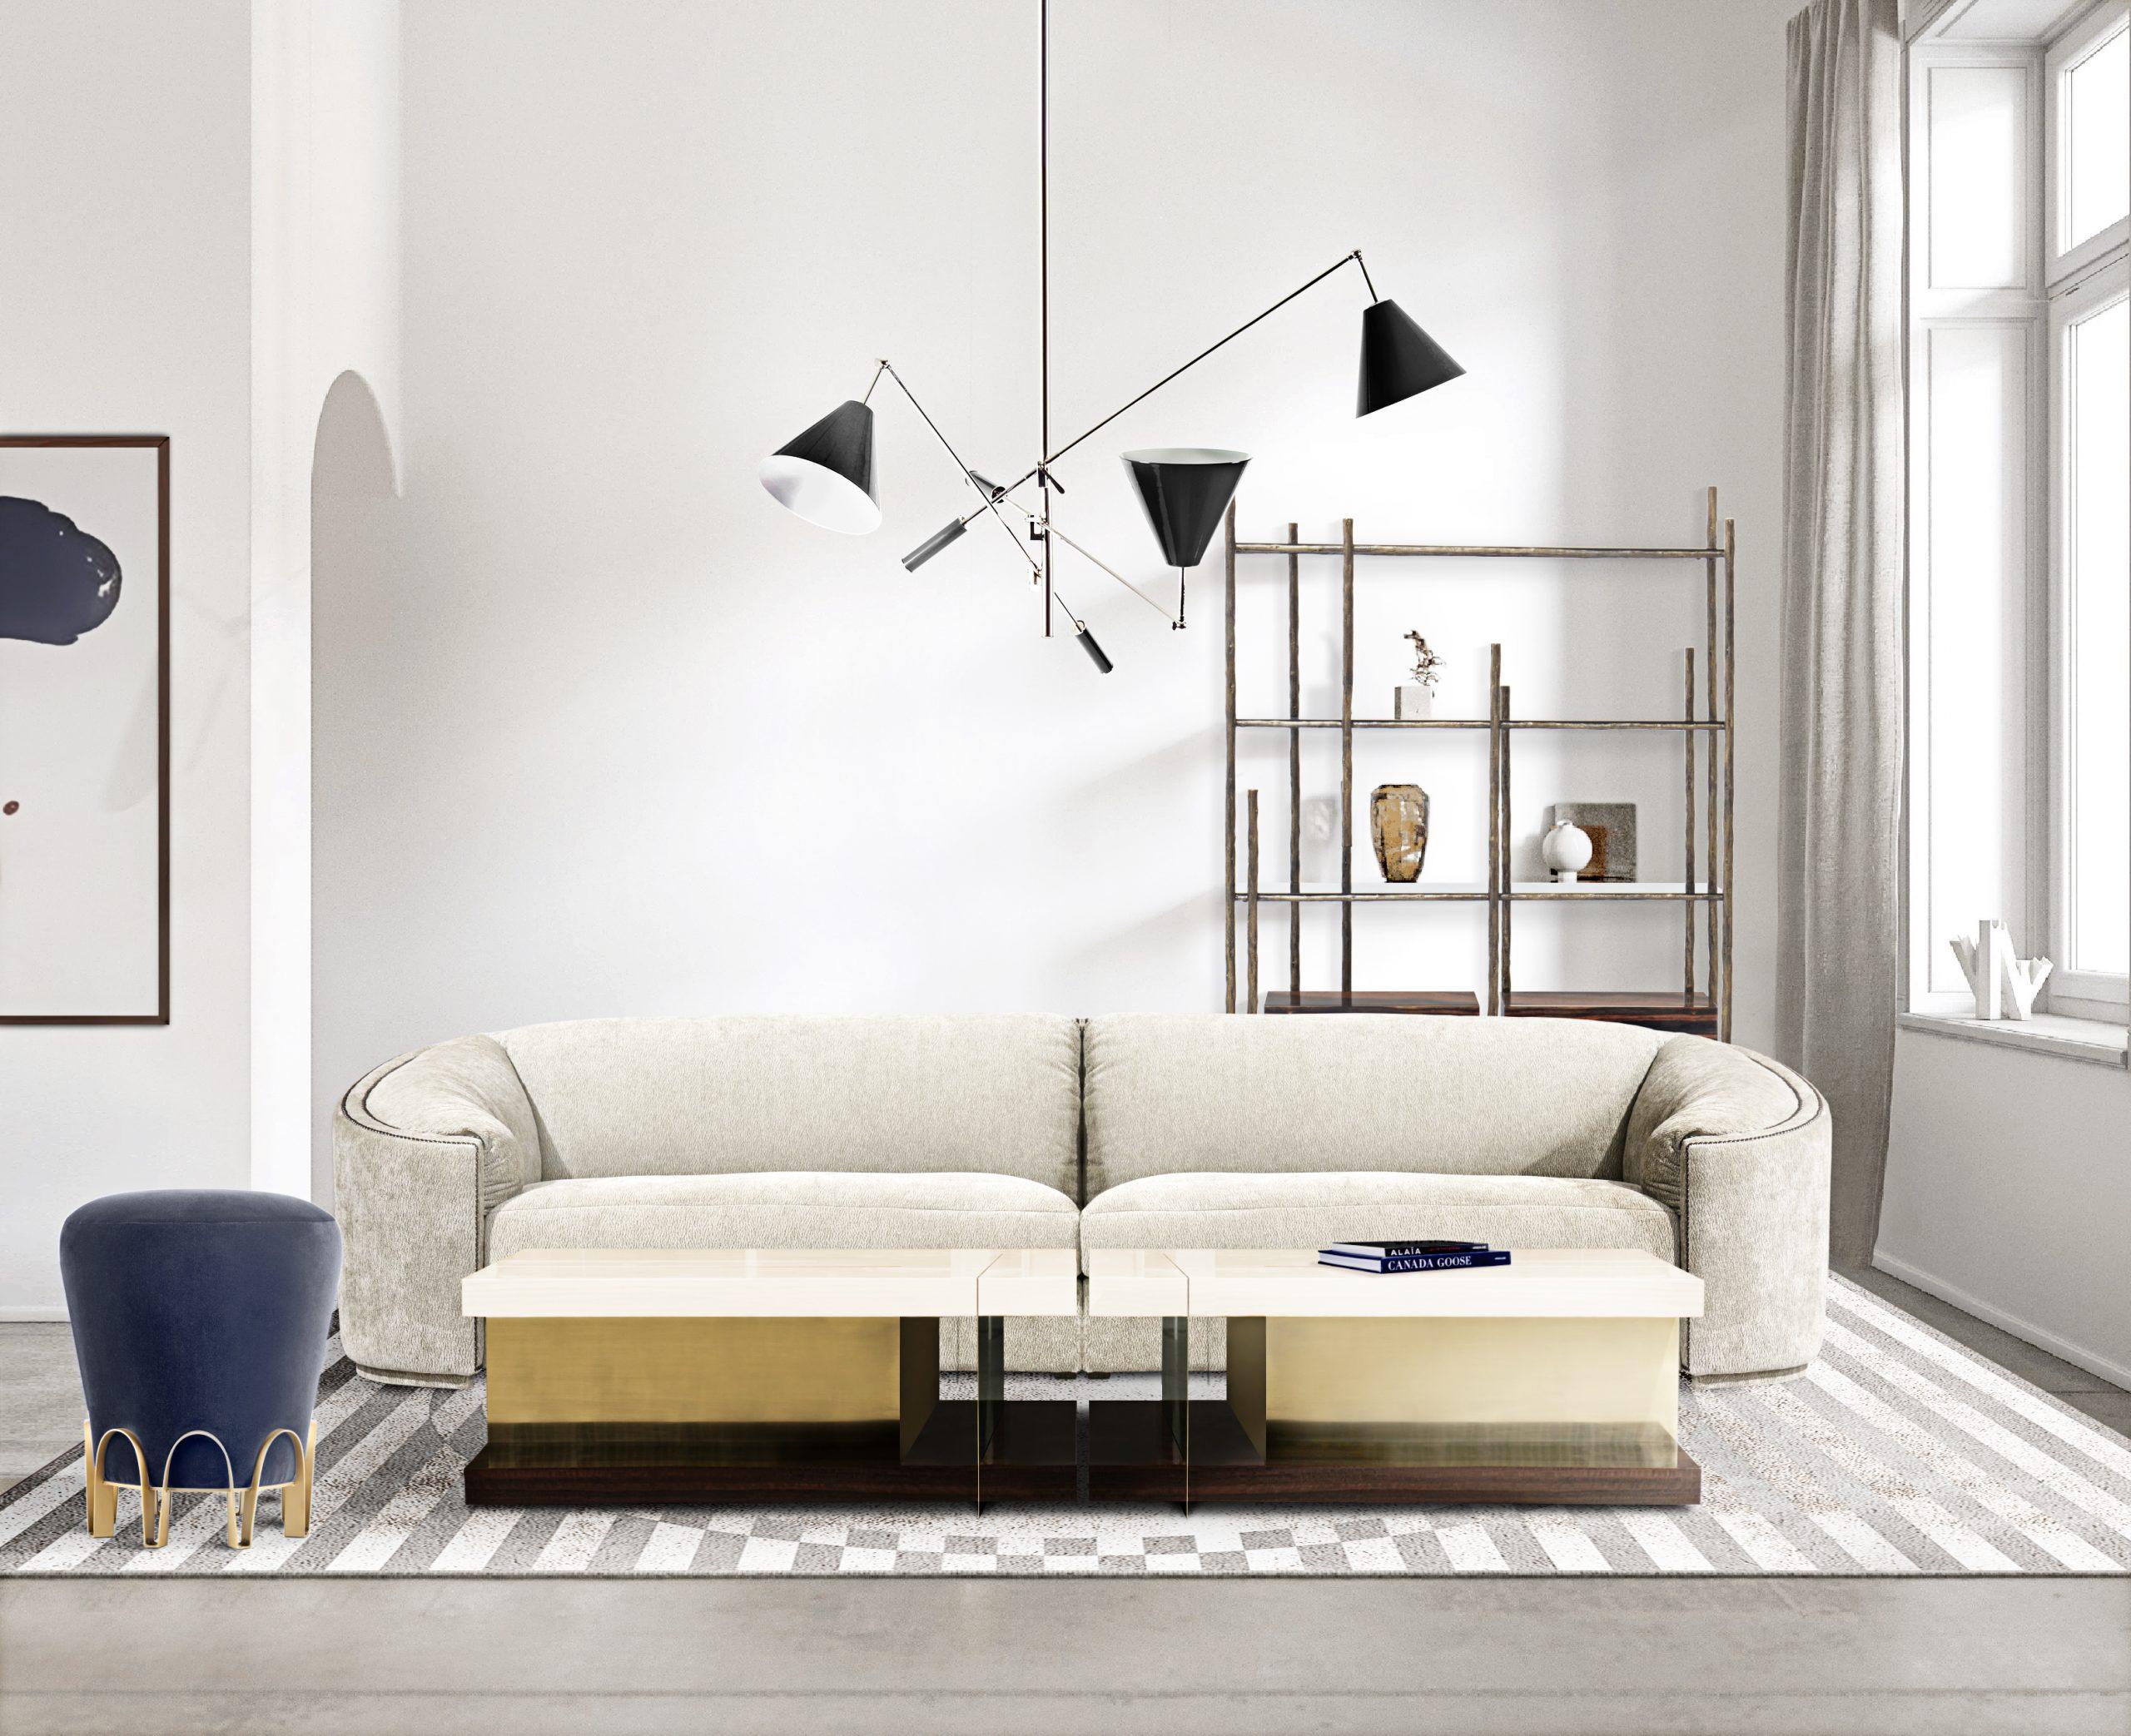 Brabbu-furniture-wallesII-sofa-lallan-center-table-insplosion